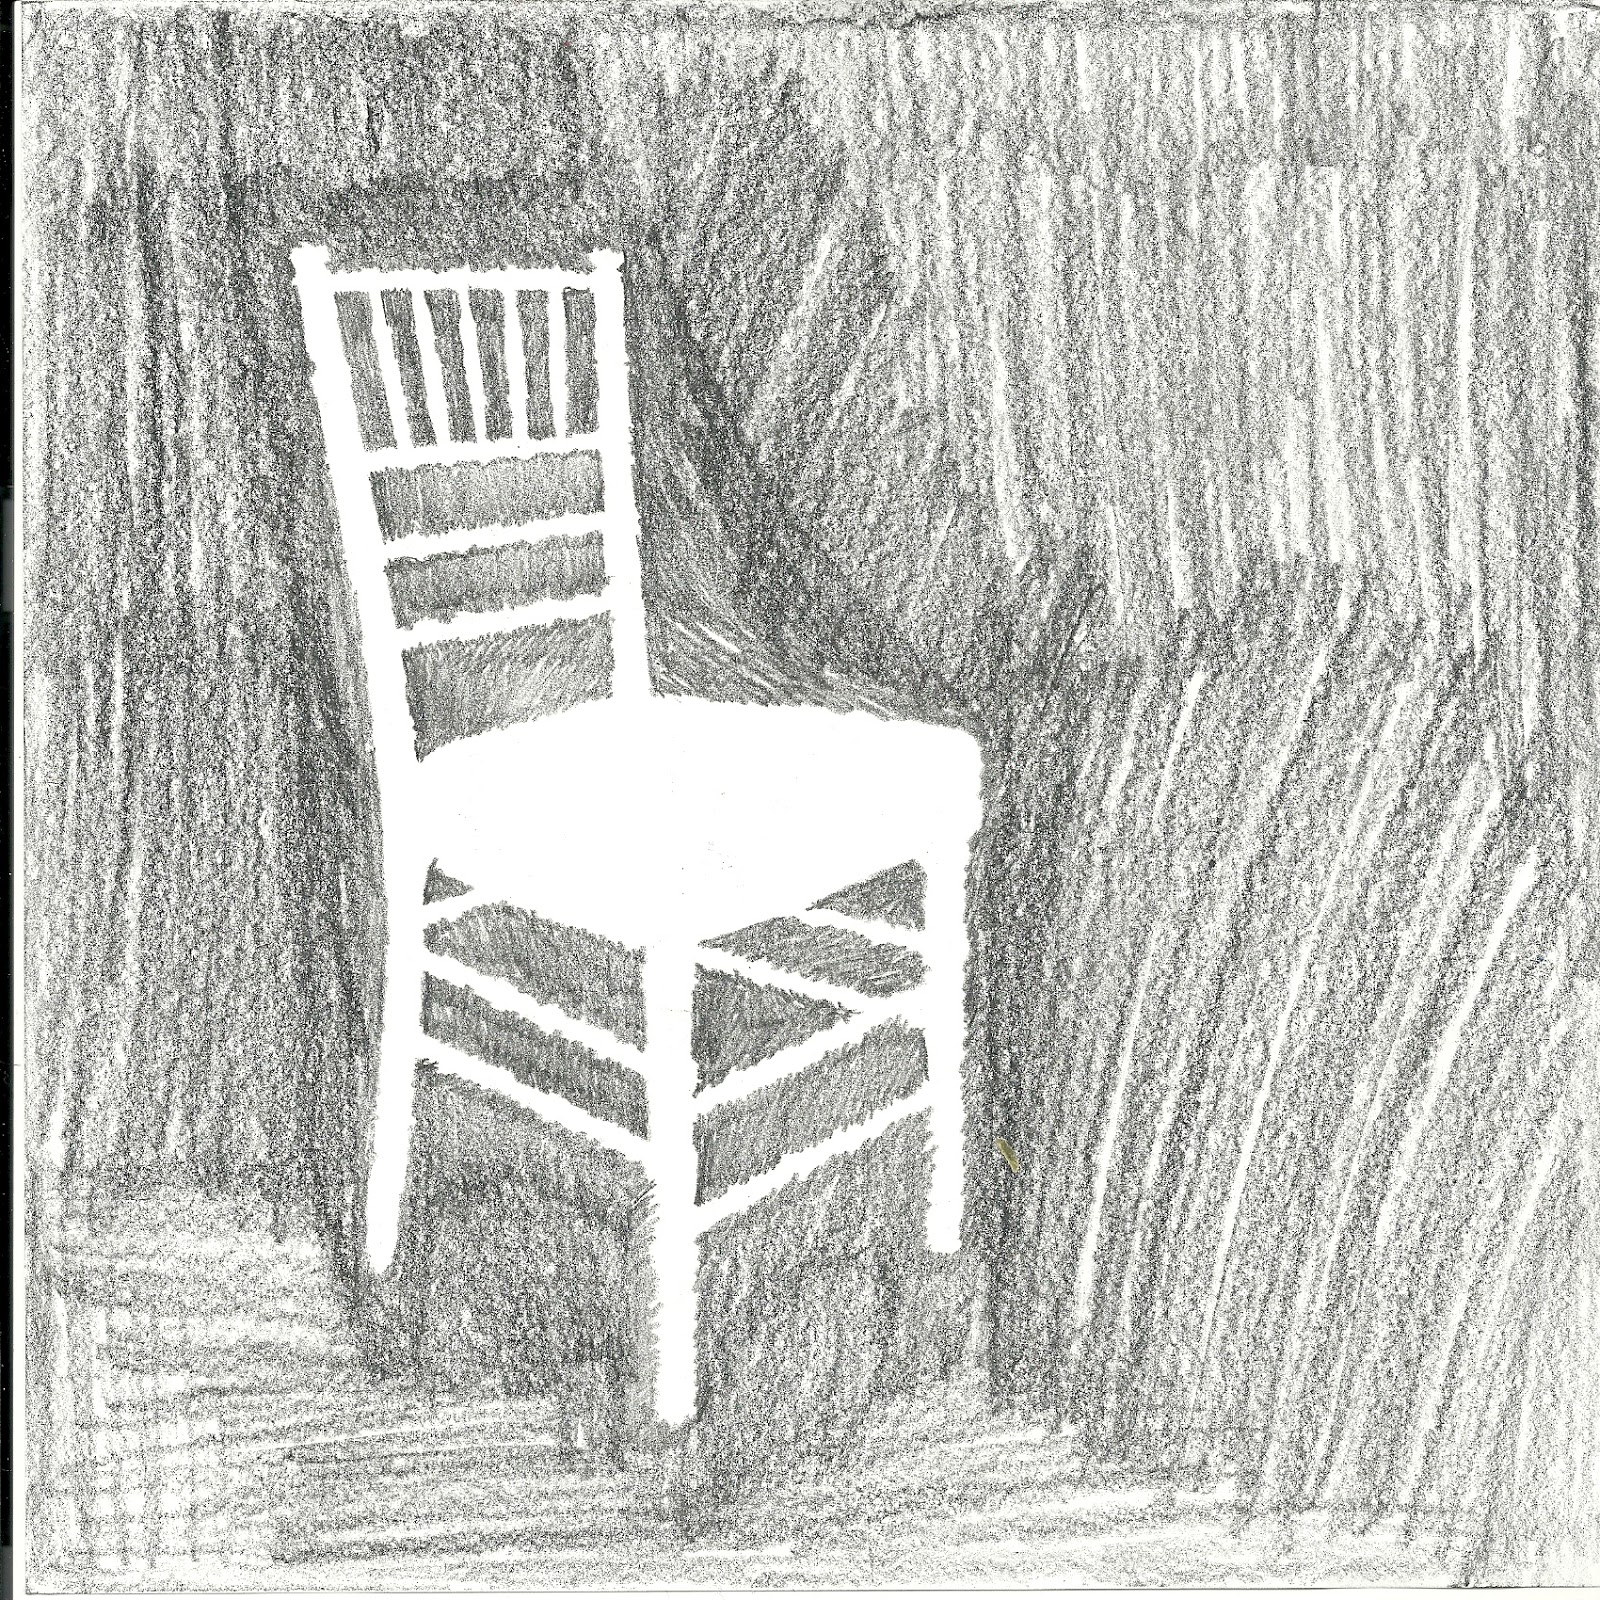 naidu design weekly sketches